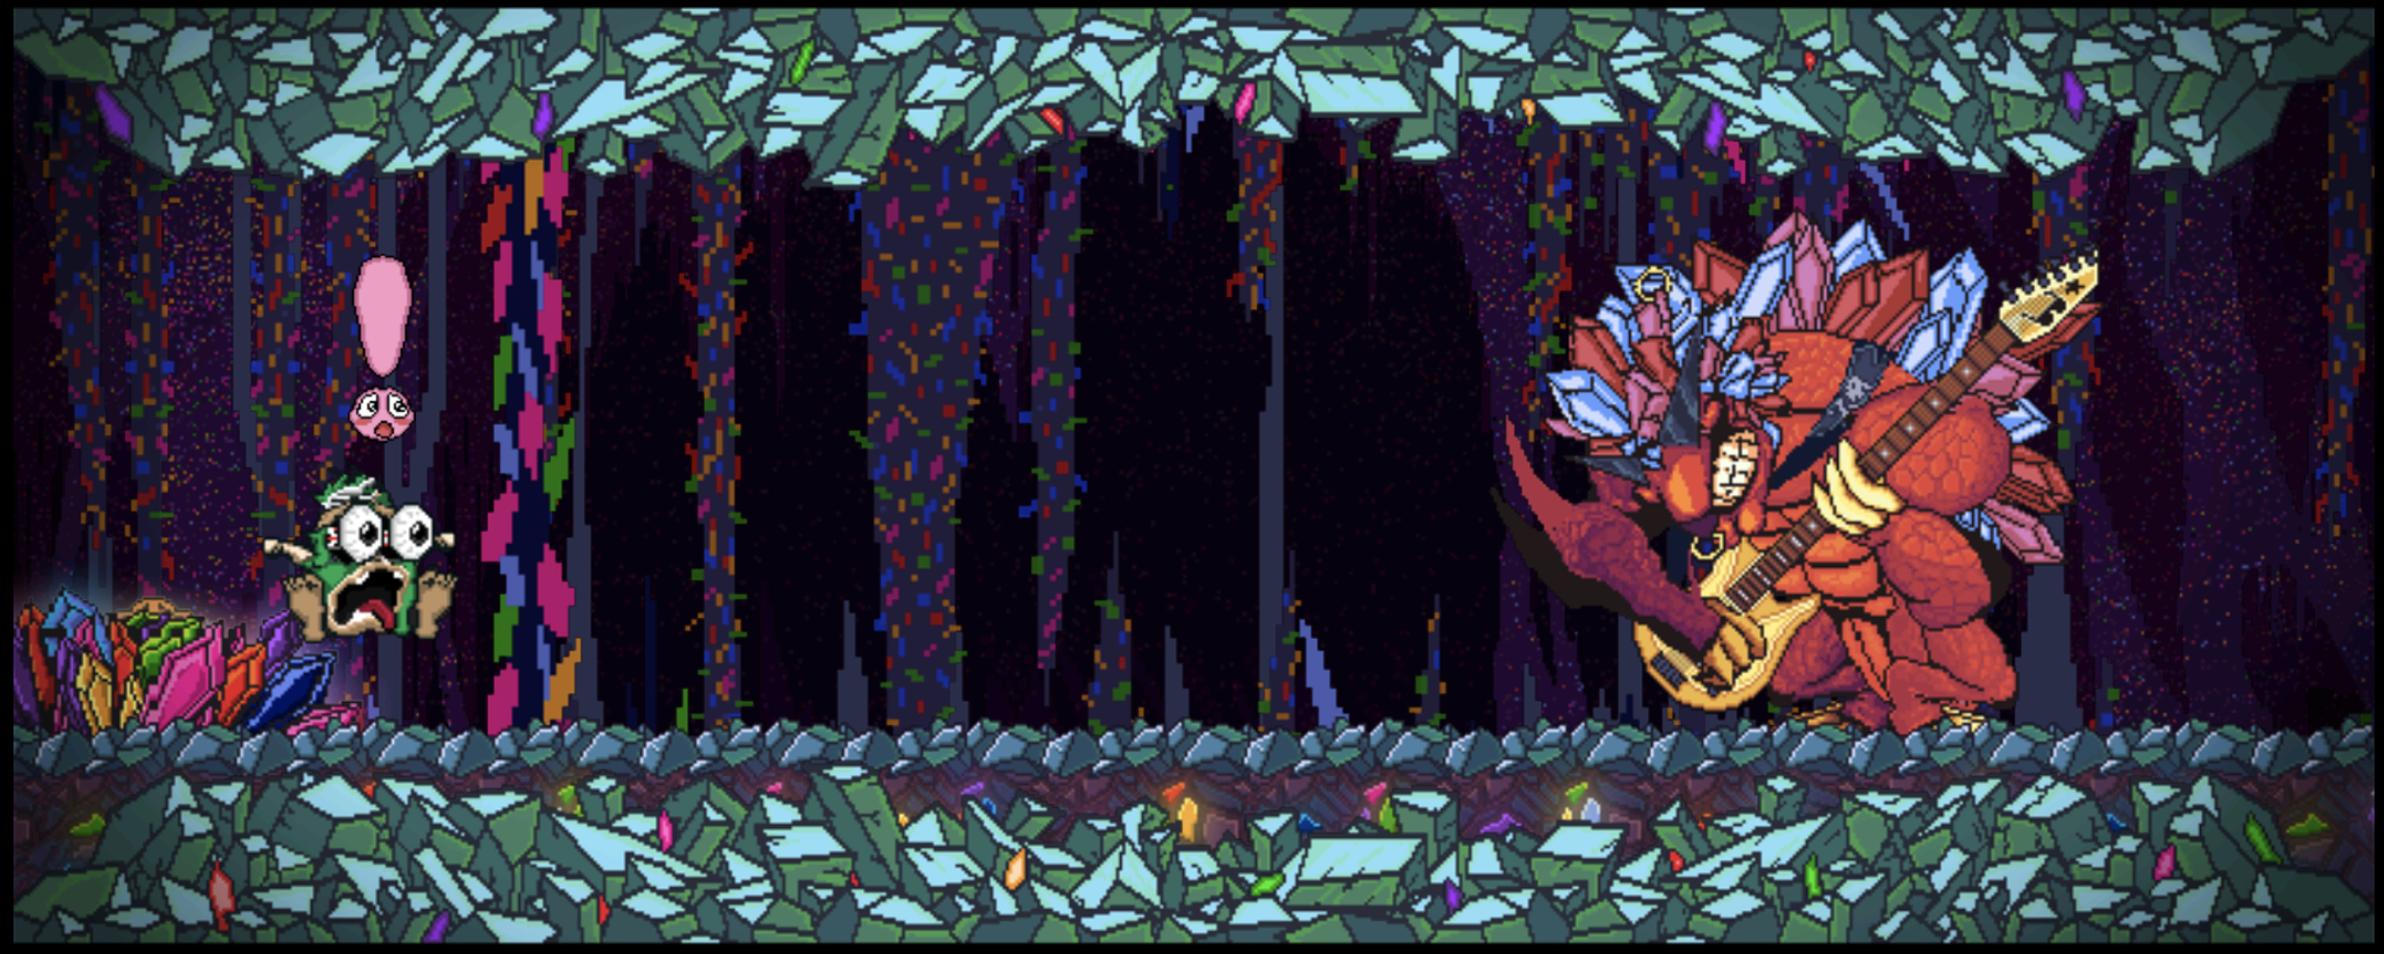 Tiki-Taki, tan grande y jugando, Cheeky Chimp Games Inc., Kickstarter